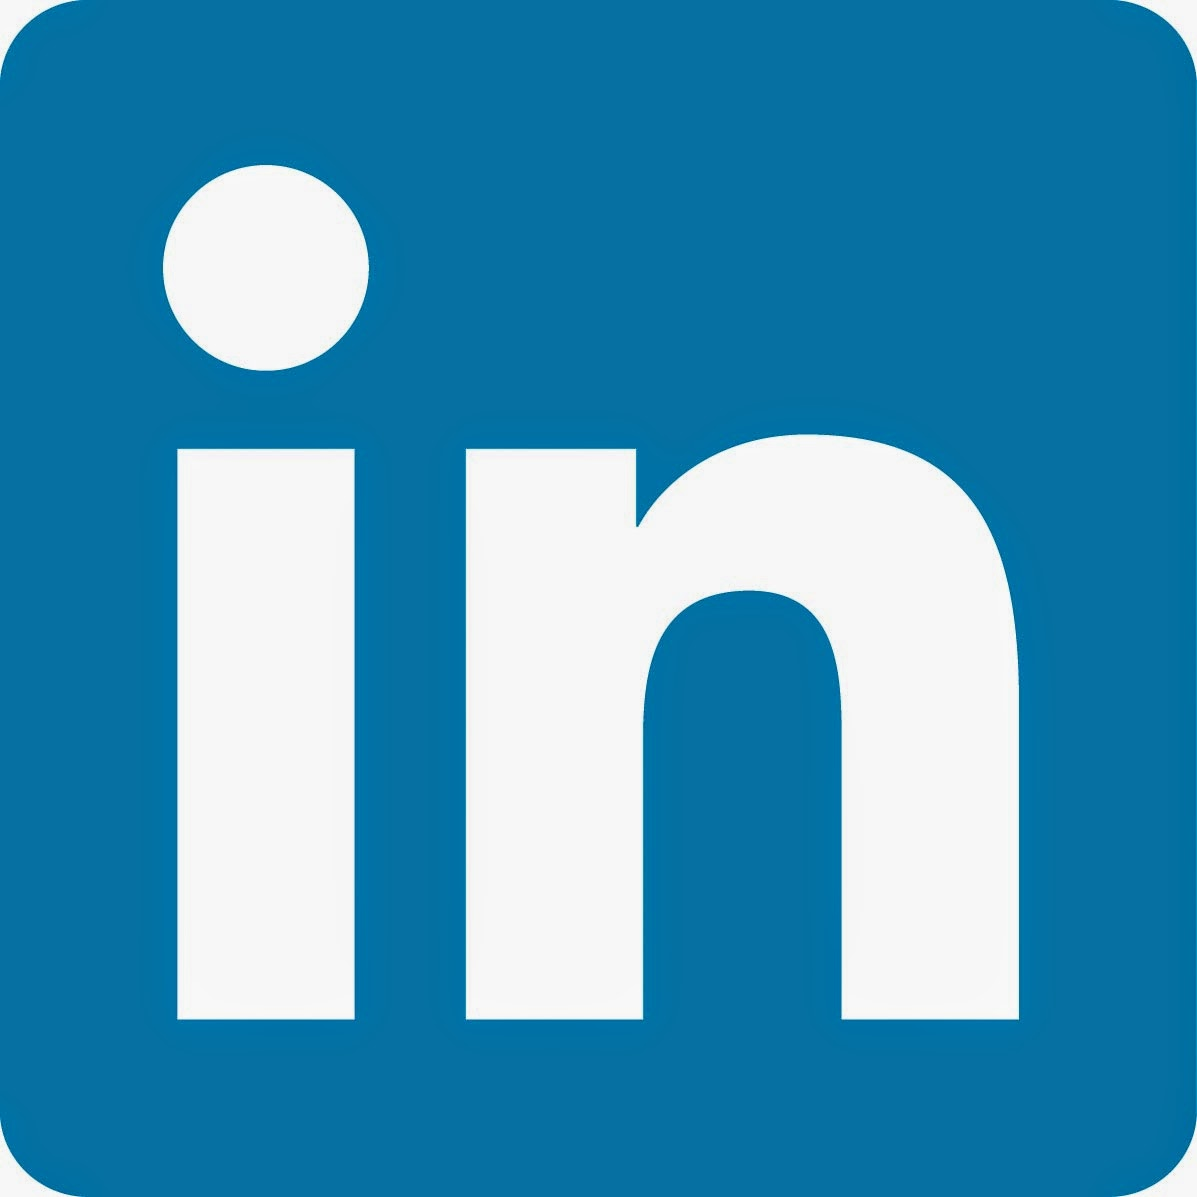 Búscame en LinkedIn